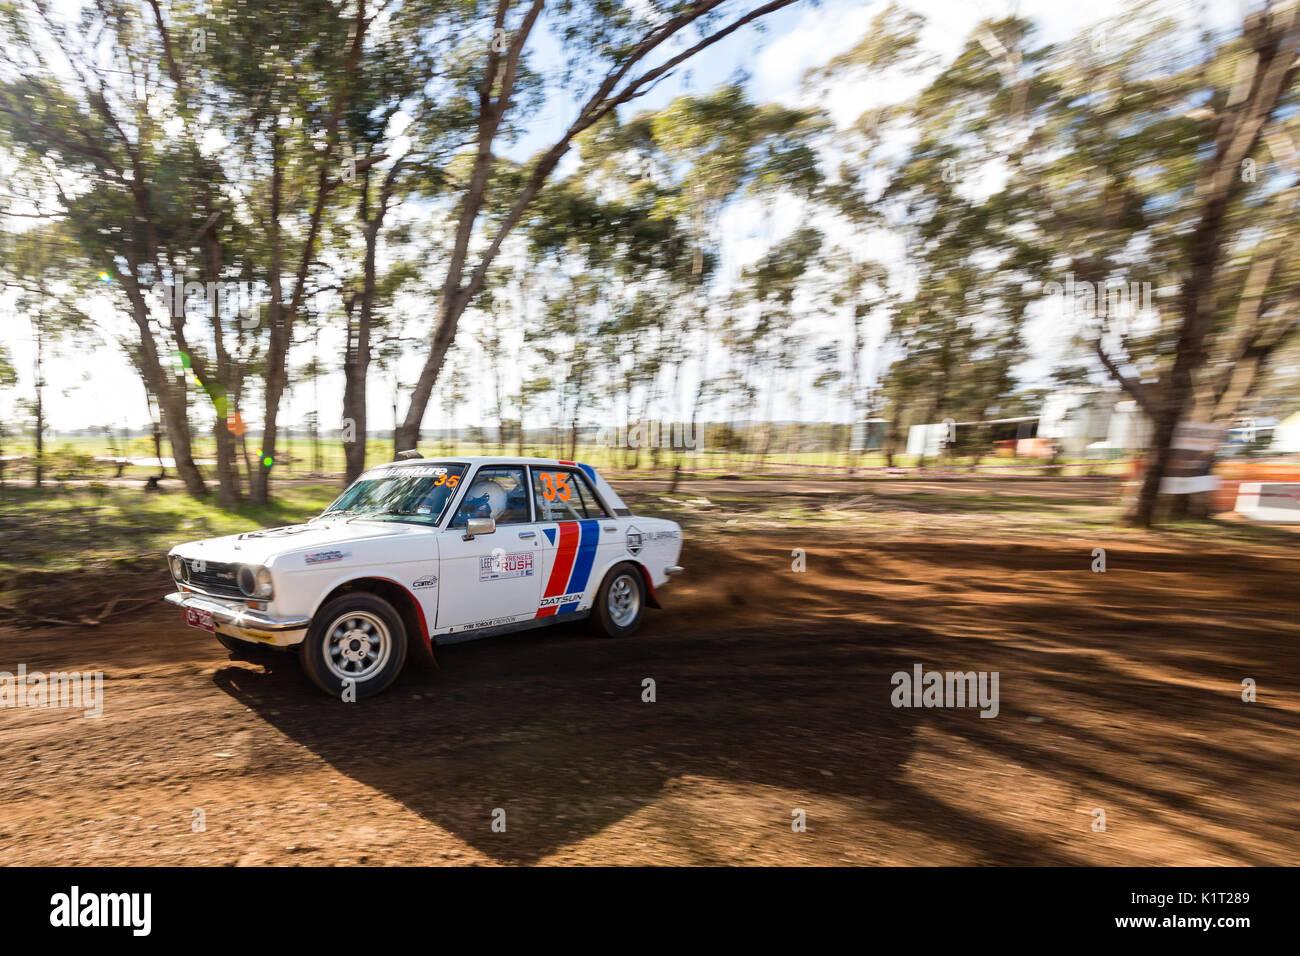 Avoca, Australia. 27th Aug, 2017. MELBOURNE, AUSTRALIA – AUGUST 27: Driver David Lawrance and Co Driver Darren Davison Stock Photo